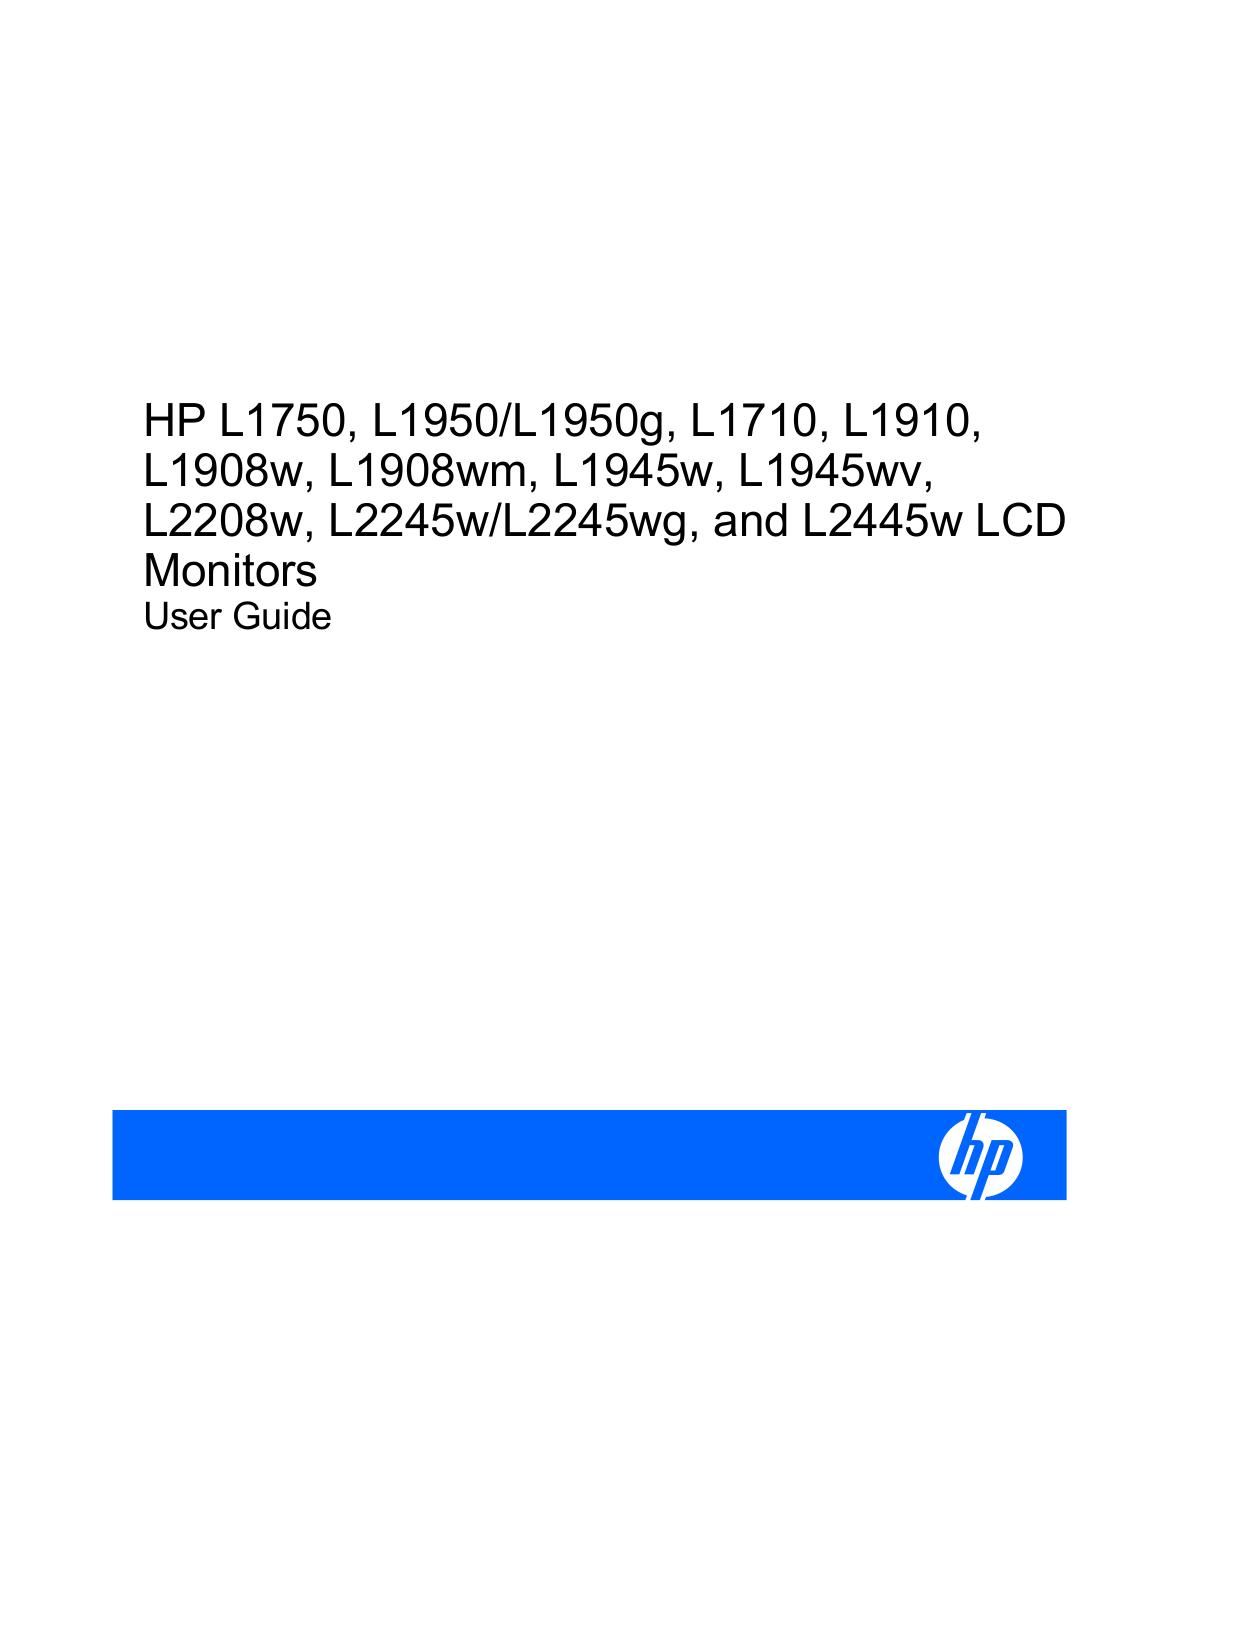 Hp l2445w user manuals download.